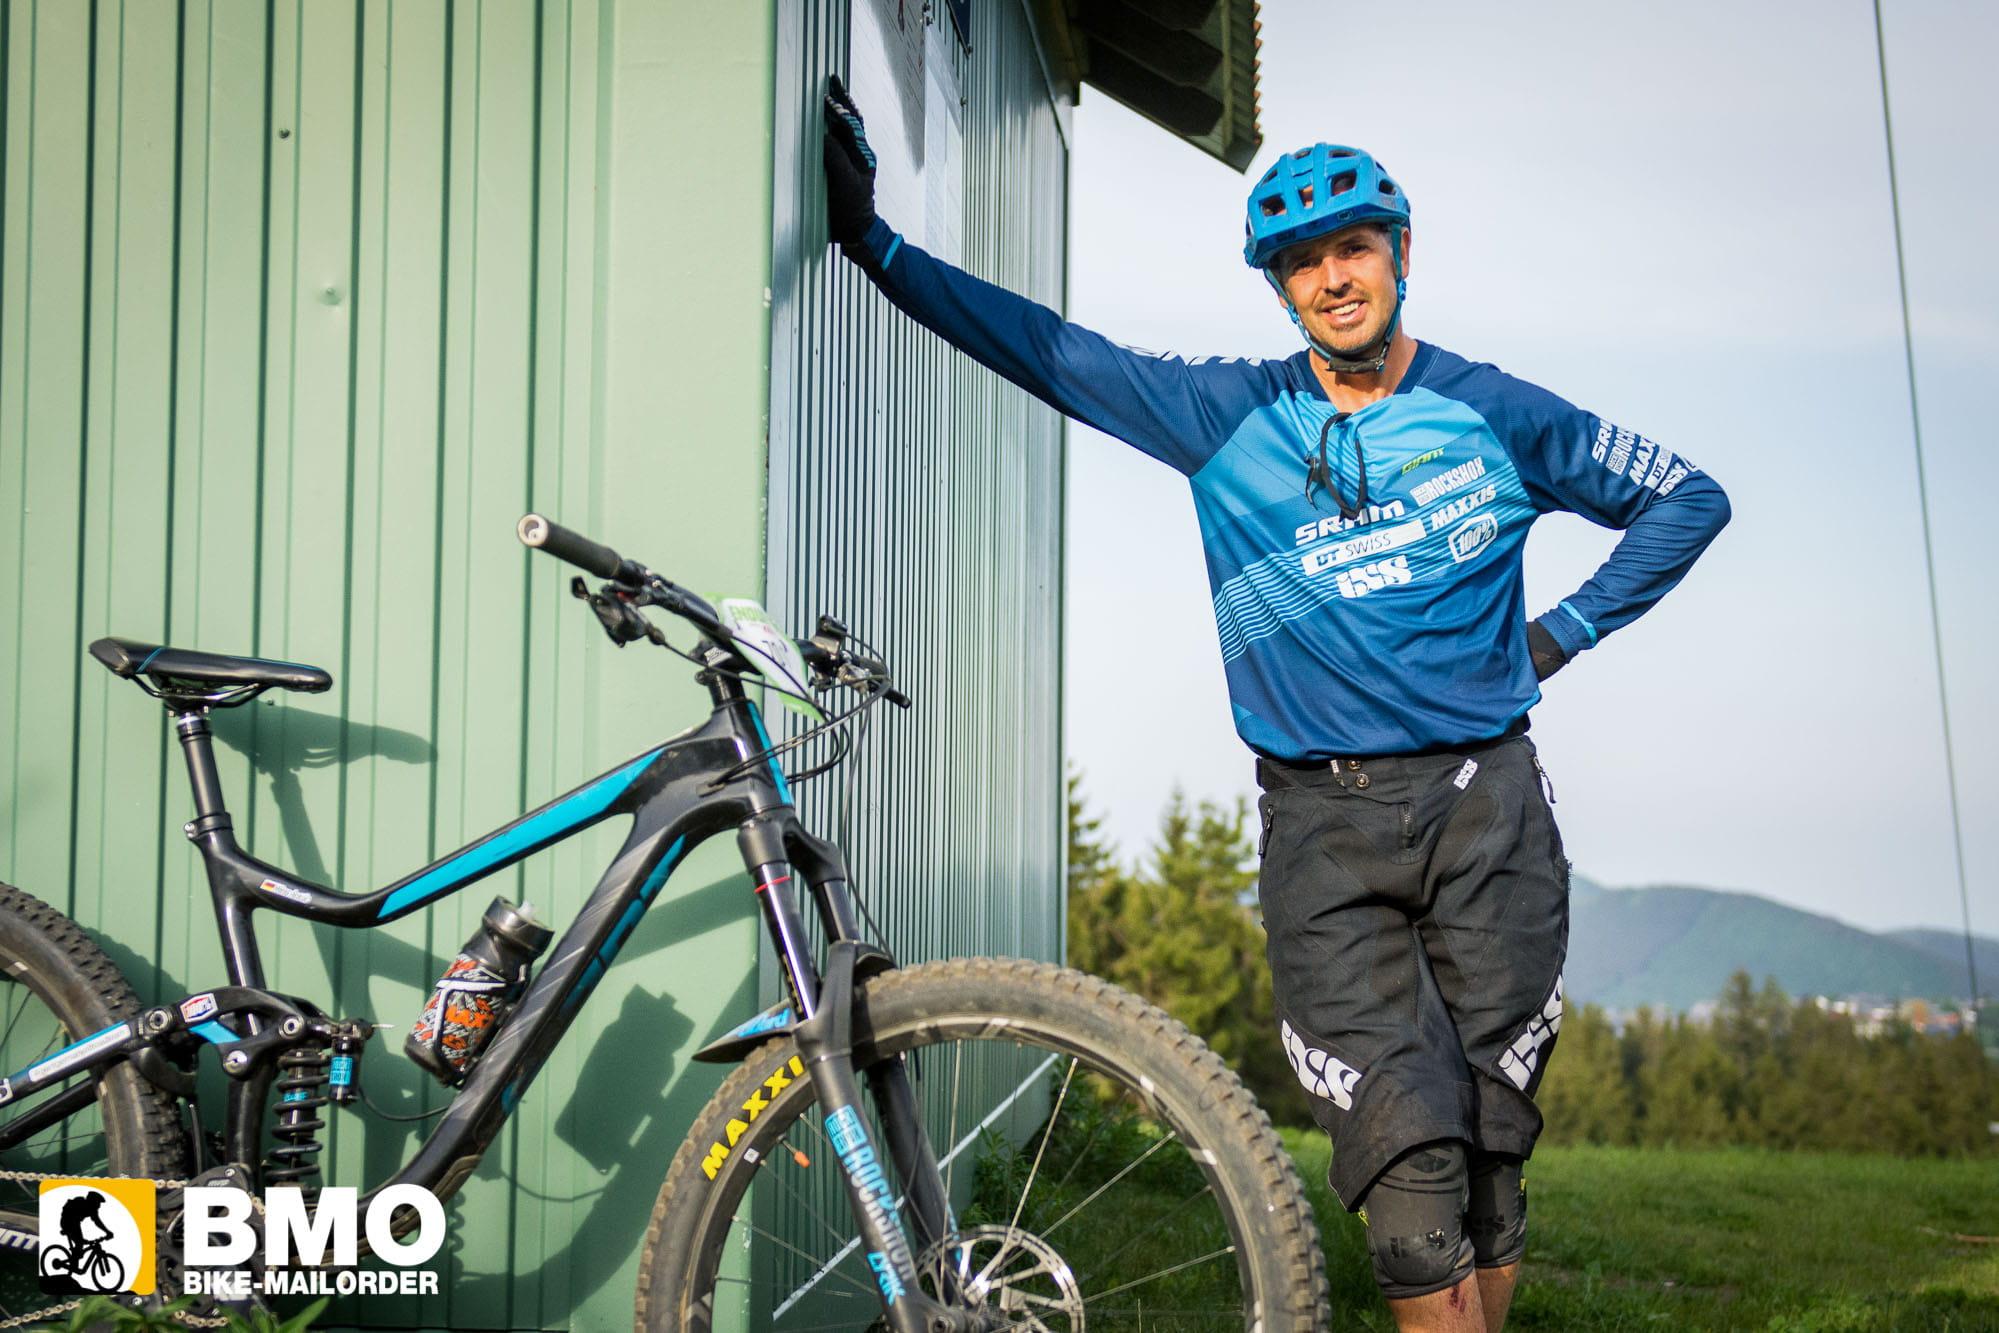 giant_bikemailorder-3